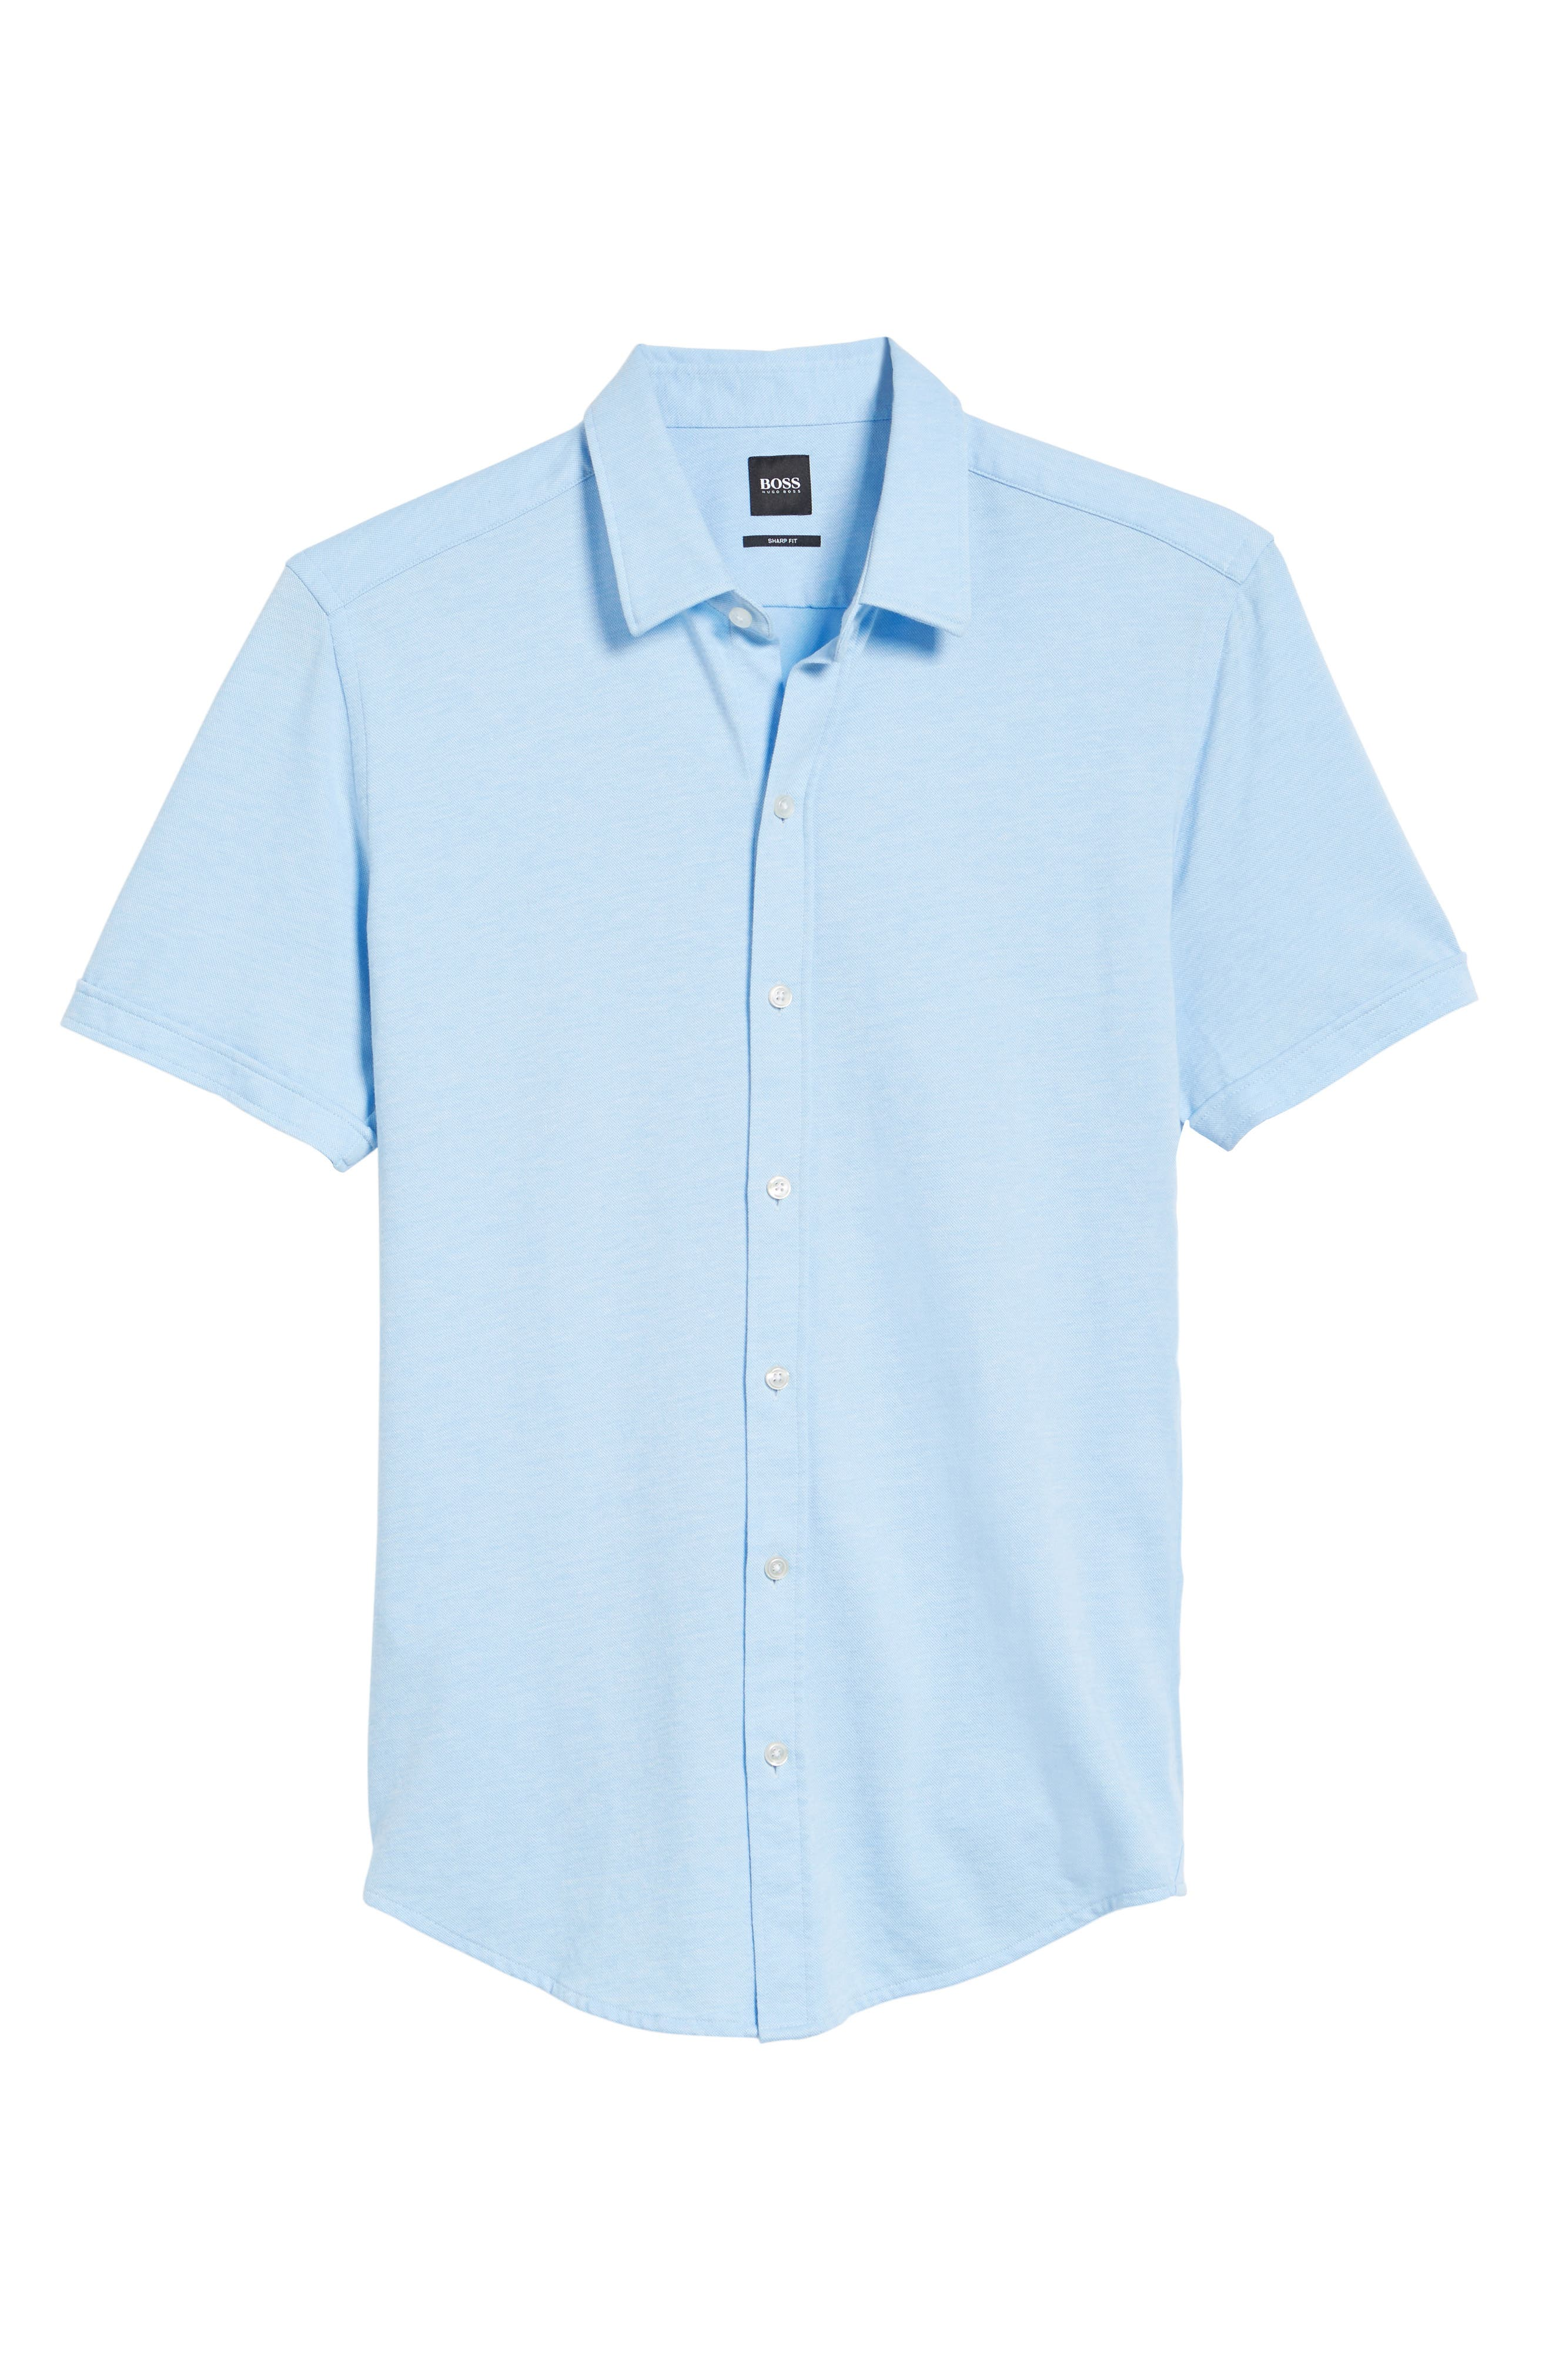 Robb Slim Fit Short Sleeve Sport Shirt,                             Alternate thumbnail 7, color,                             Light Blue